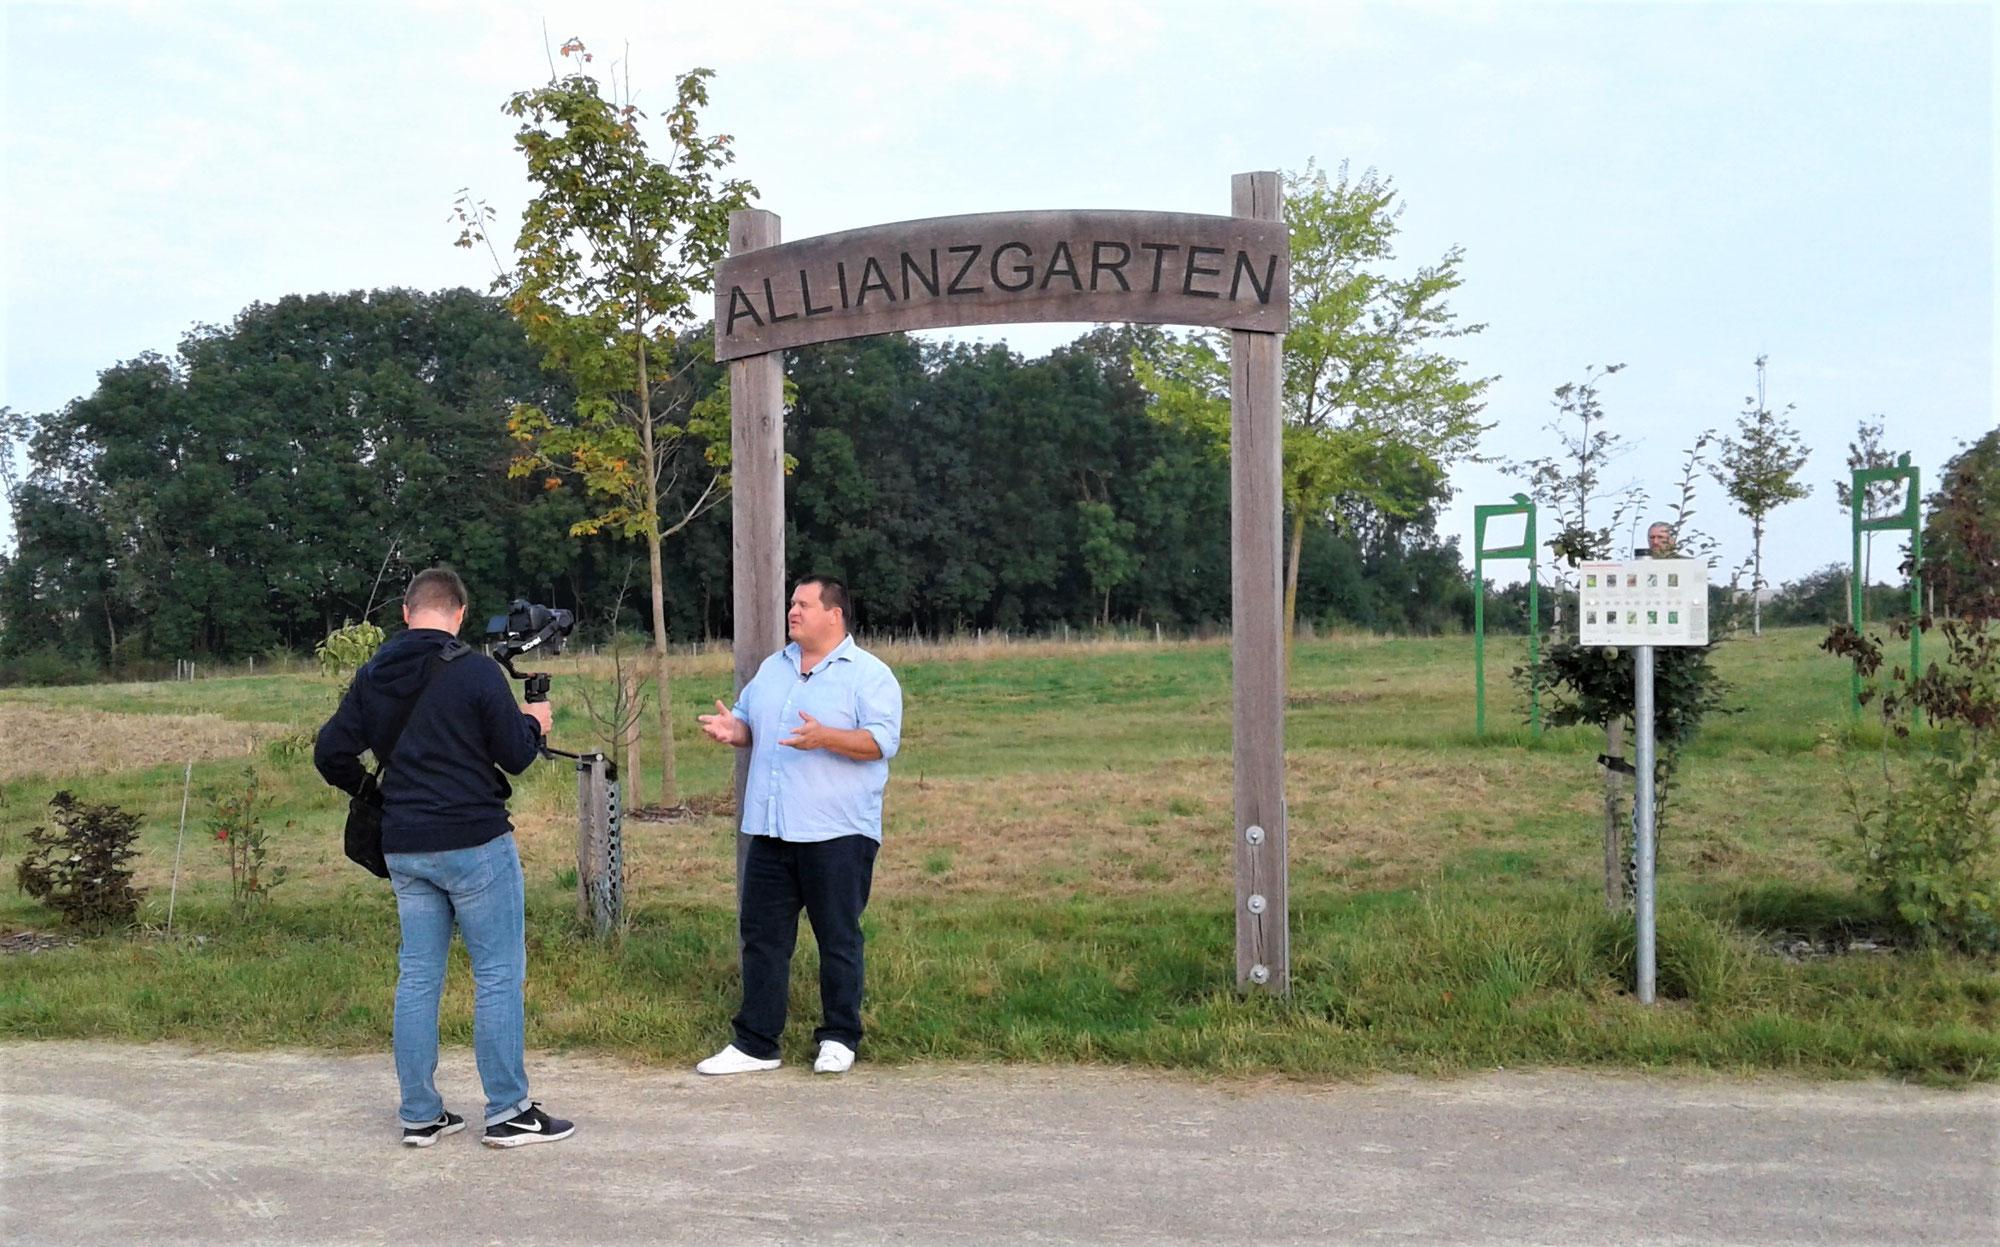 Fernsehkoch Wolfgang Link zu Gast im Allianzgarten